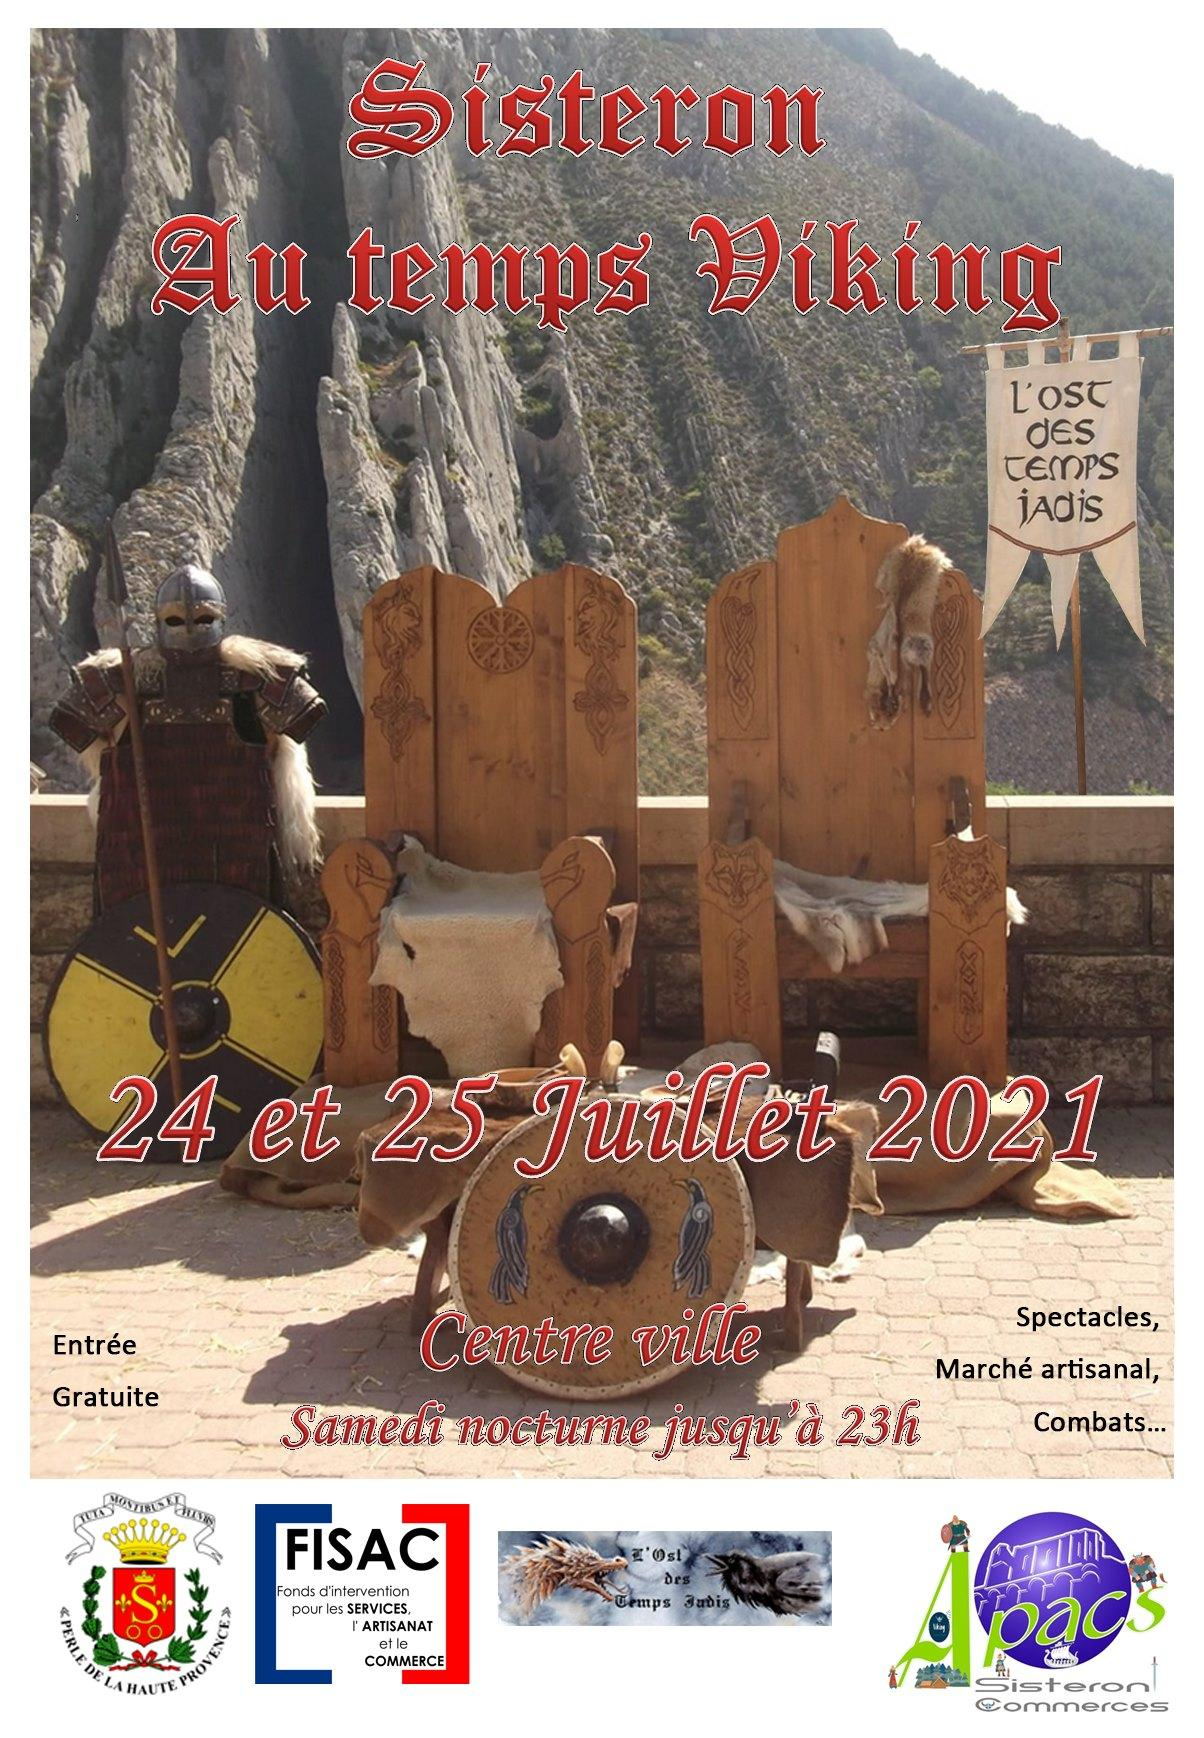 Sisteron au Temps Viking